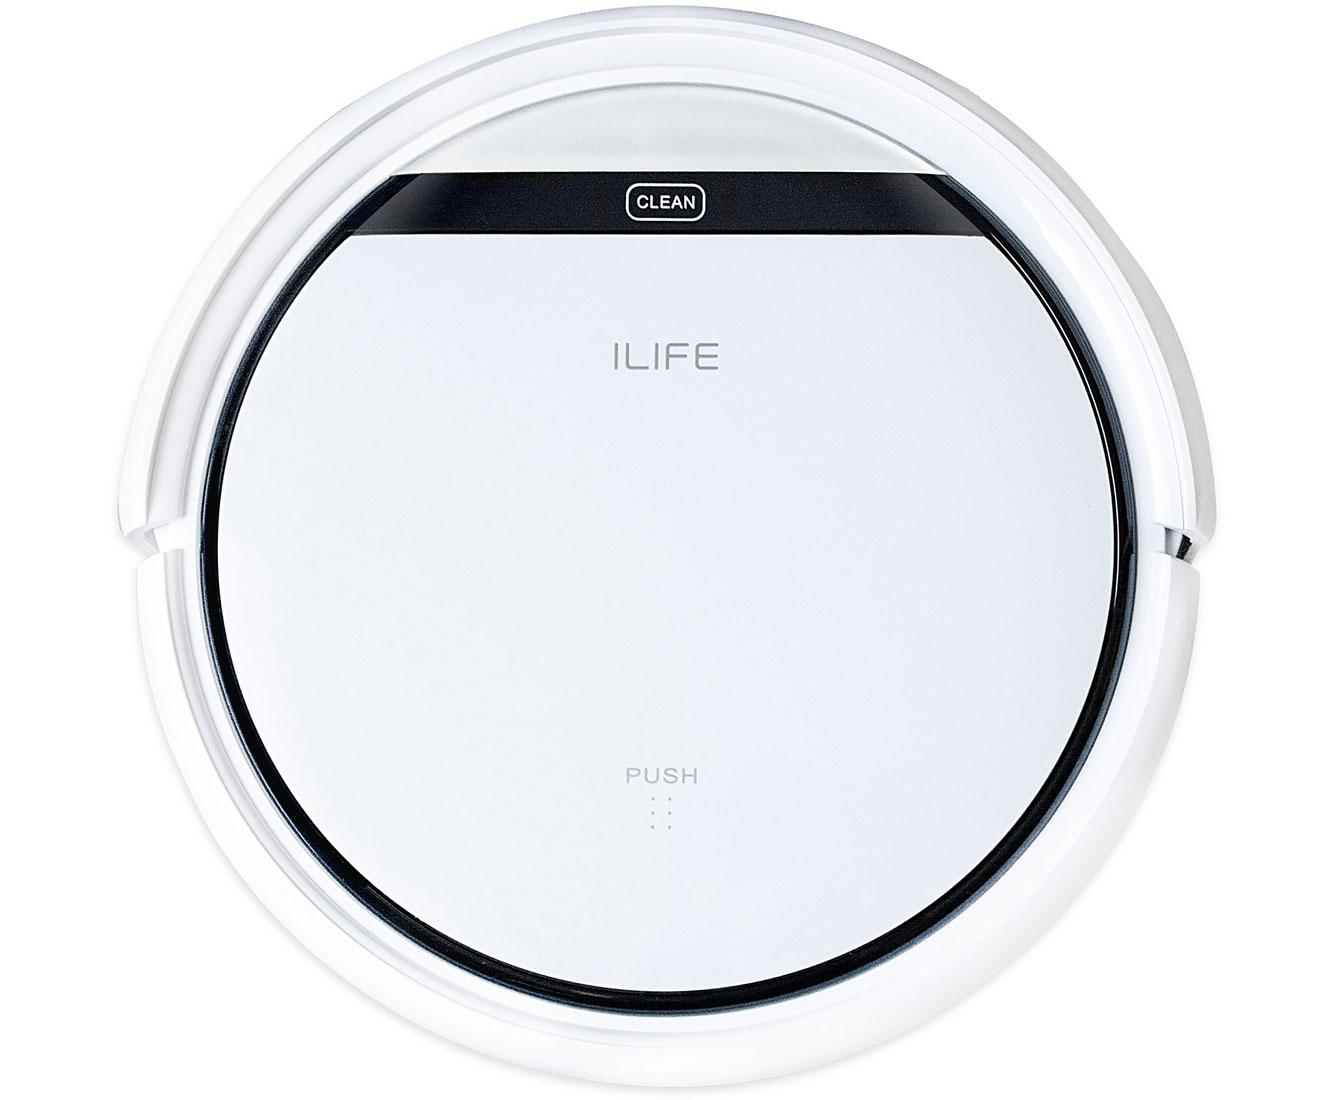 ILIFE Beetles V3s Pro Staubsauger - Weiß | Flur & Diele > Haushaltsgeräte | Weiß | ILIFE